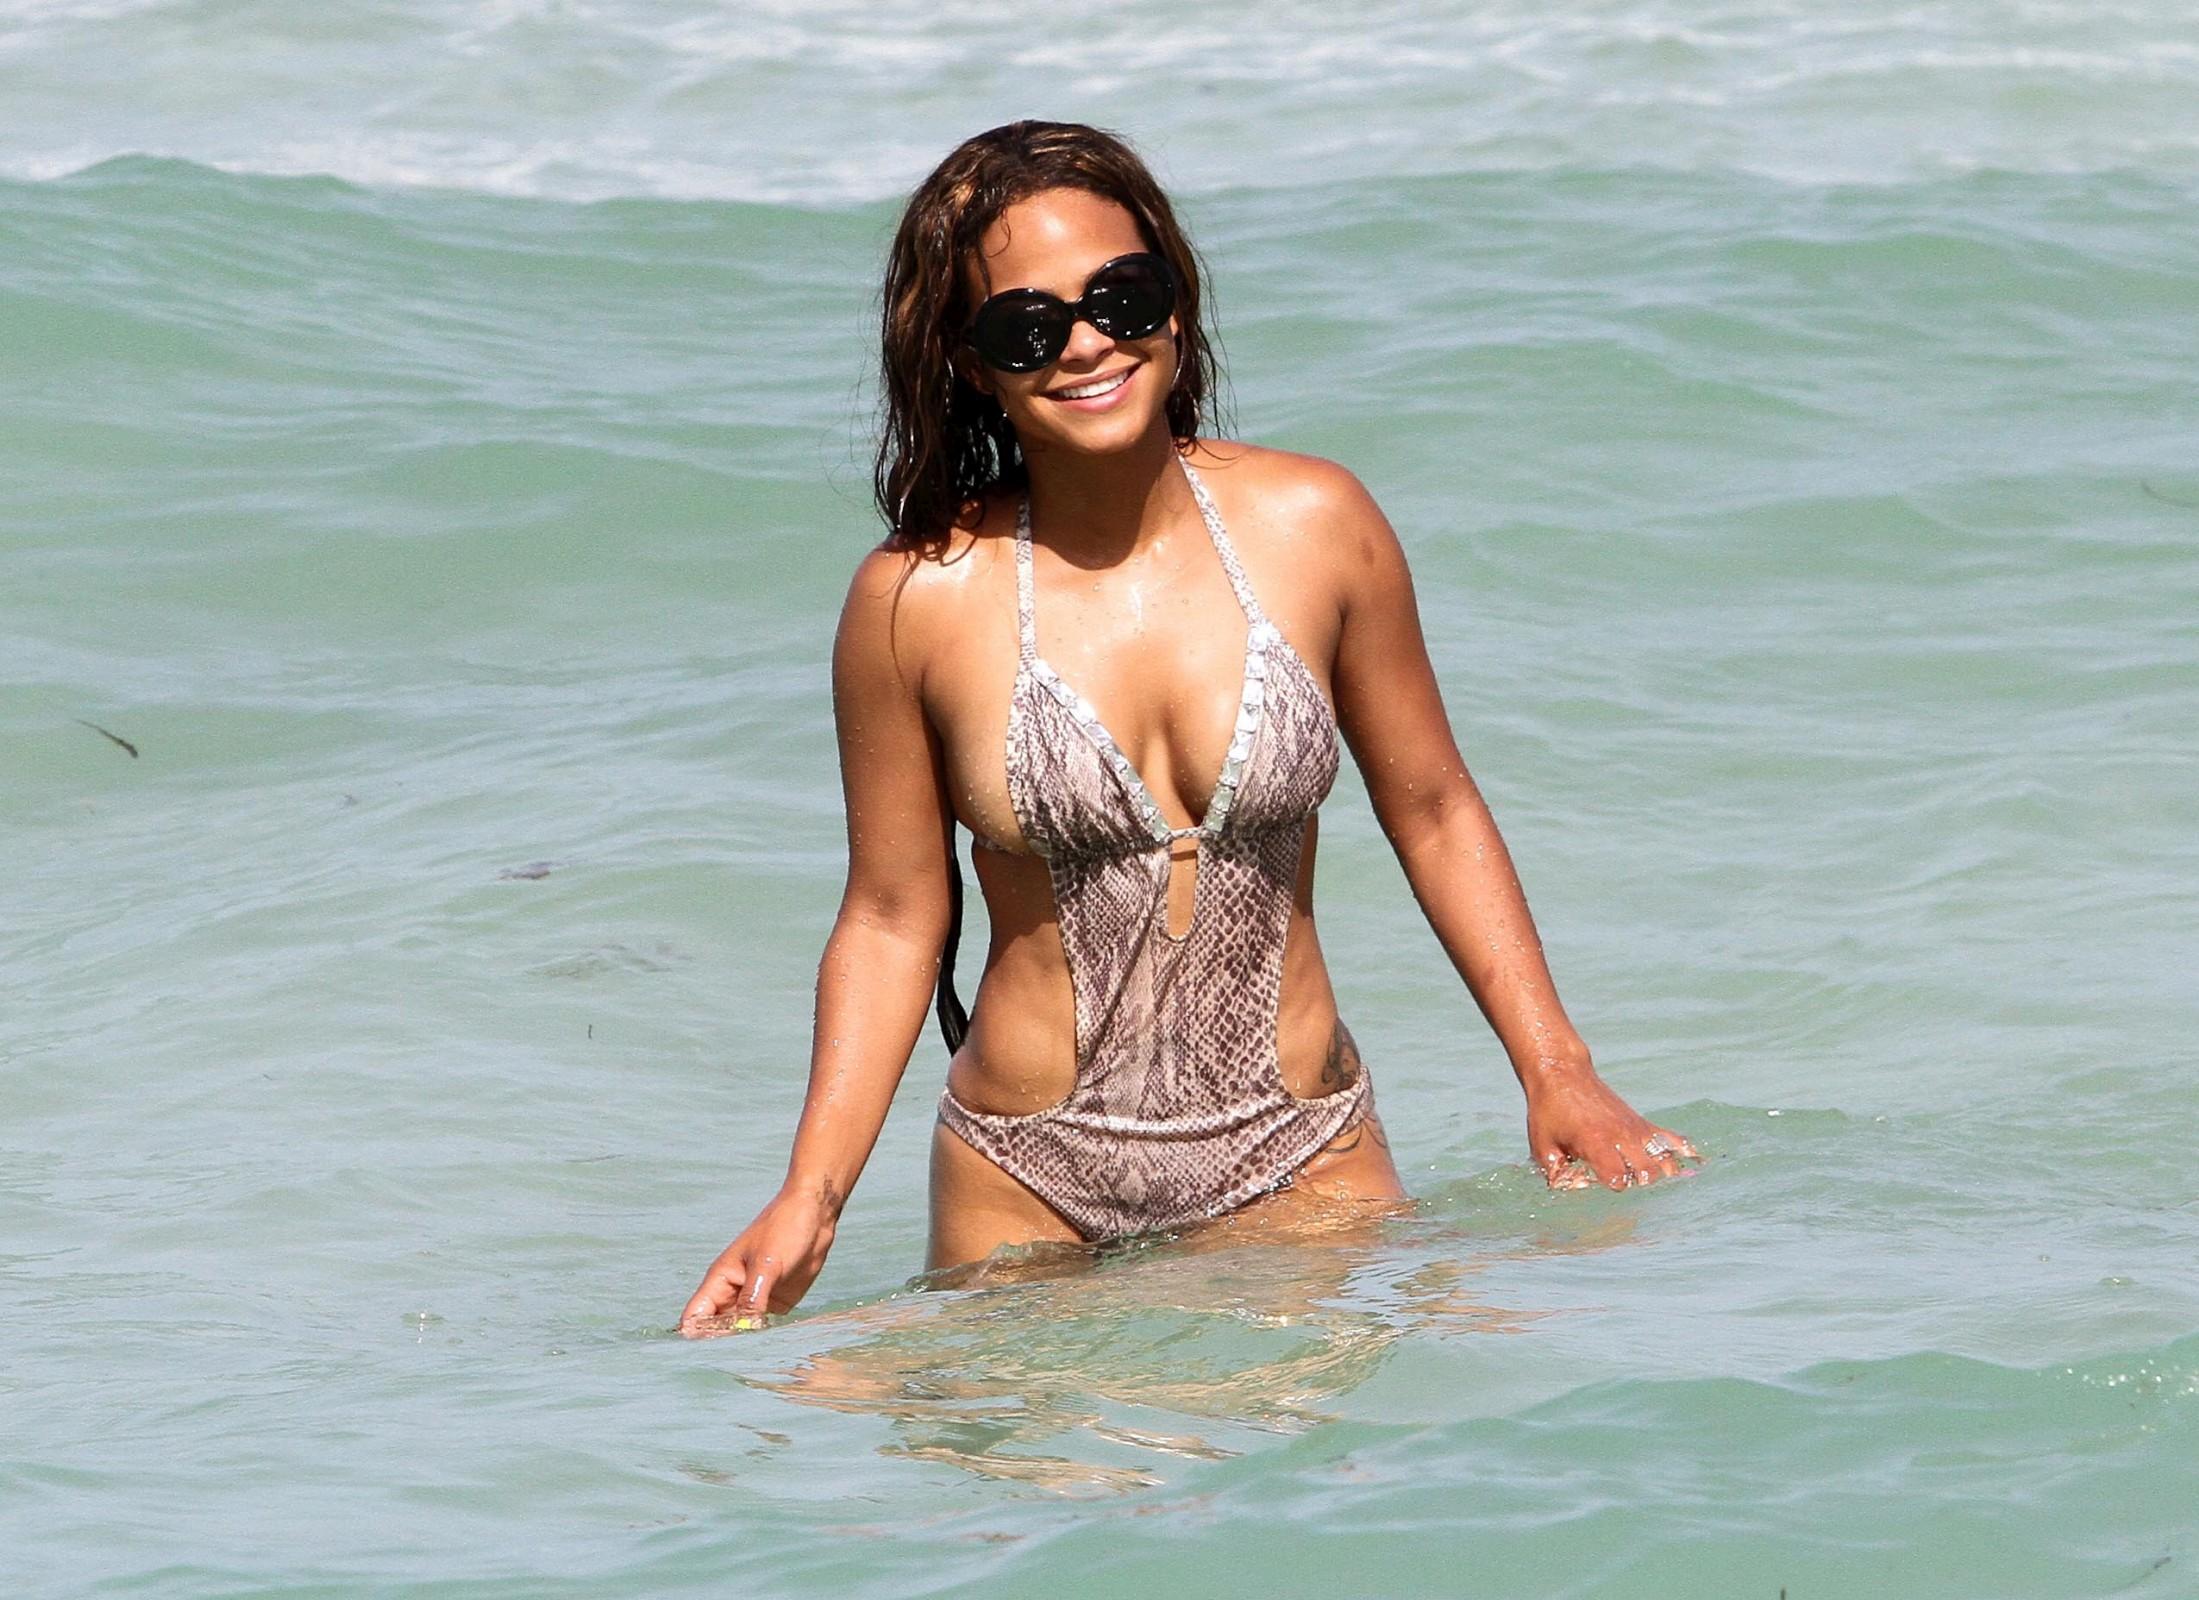 Cristina fernandez de kirchner bikini